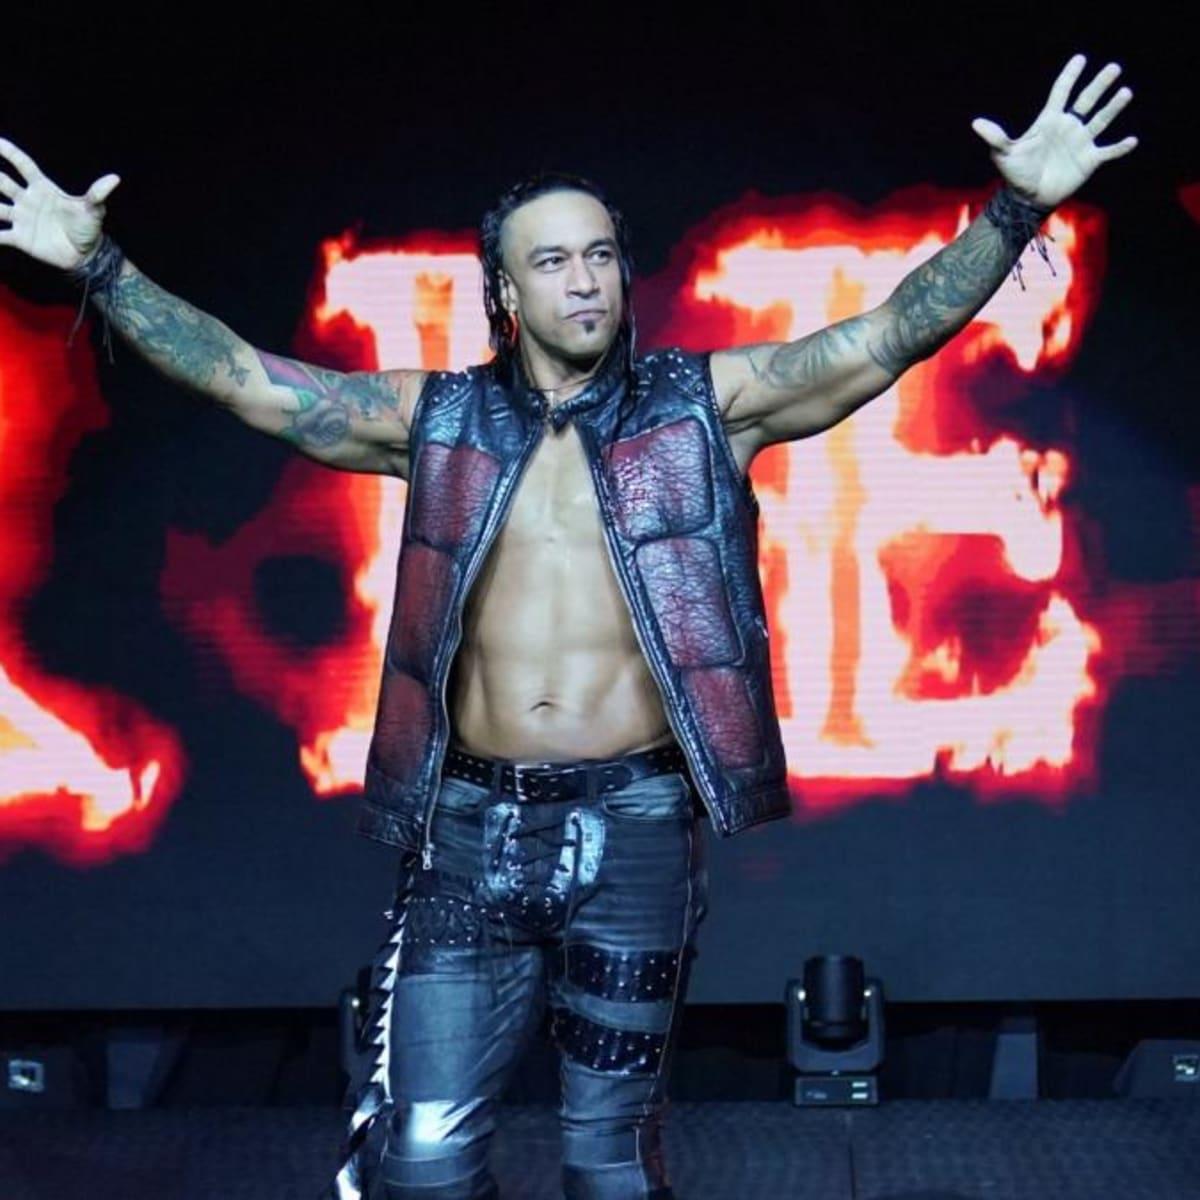 Damian Priest in NXT / WWE